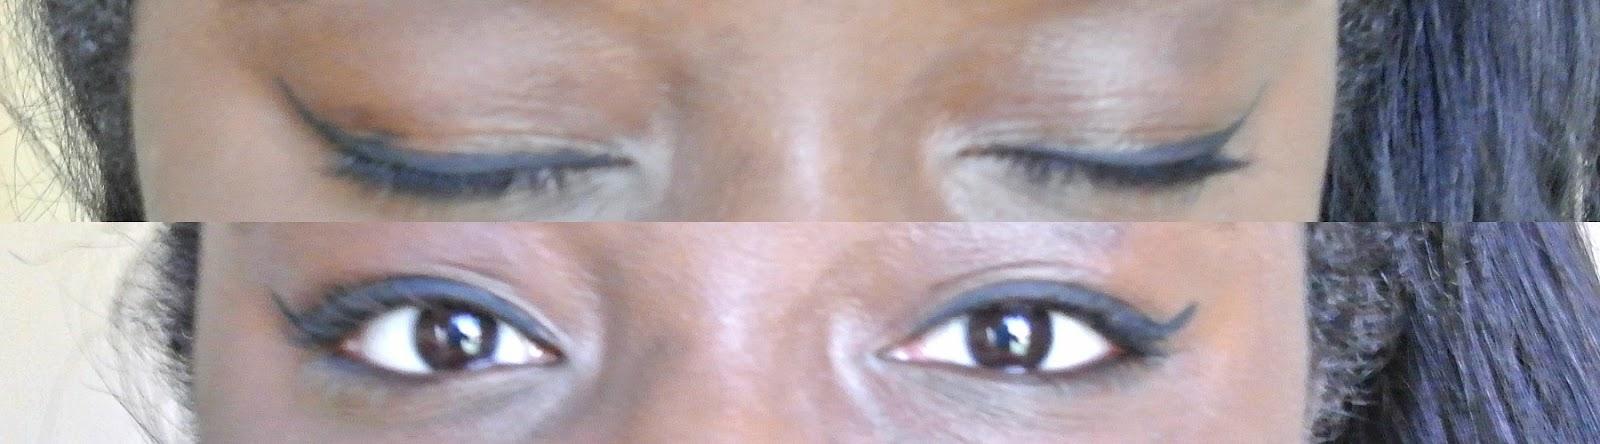 Fall Makeup 6.jpg